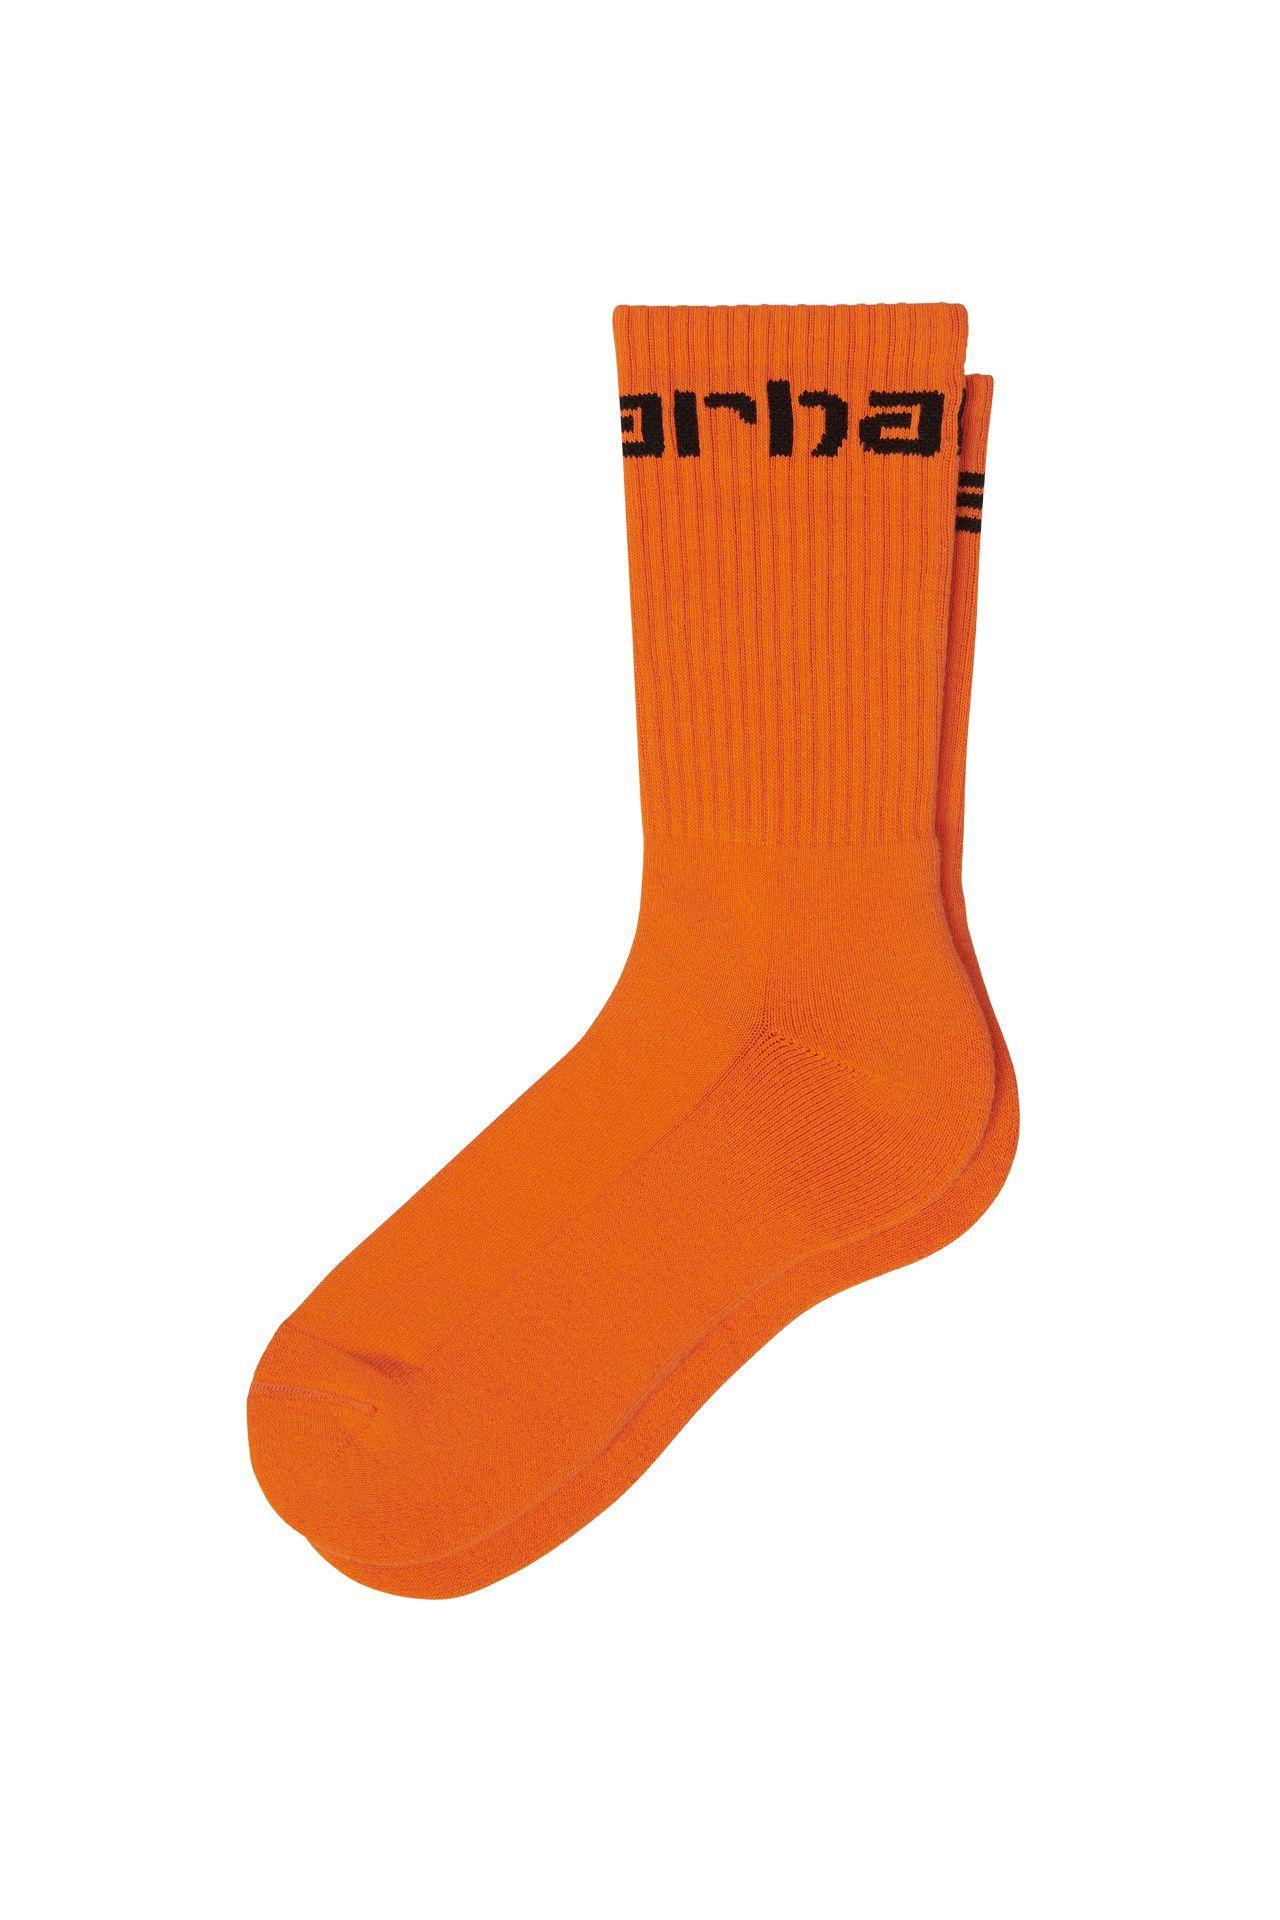 Afbeelding van Carhartt WIP Sokken Carhartt Socks Hokkaido/Black I029422